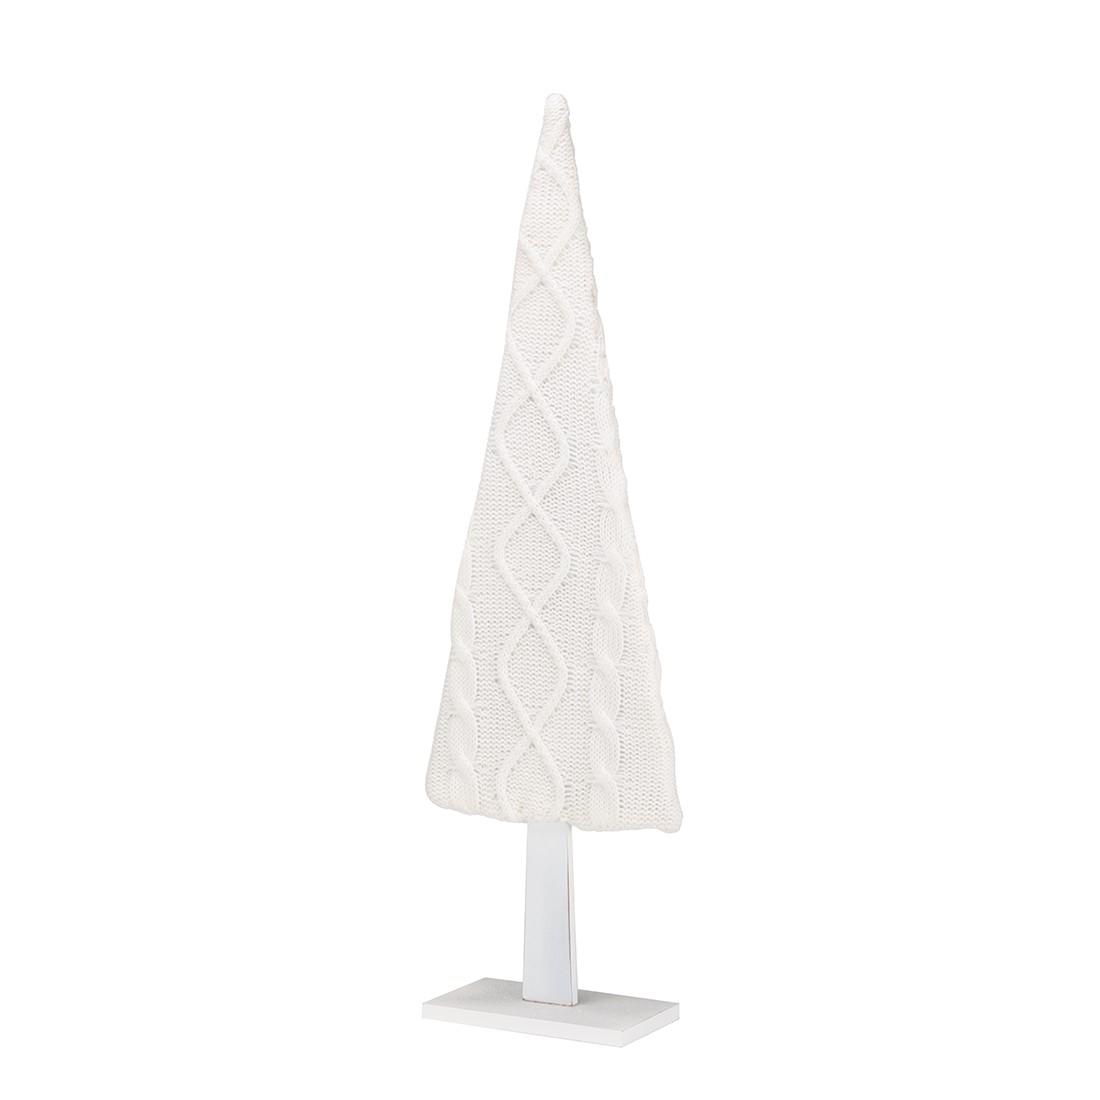 Boom Artemis - hout wit, Home24 Deko